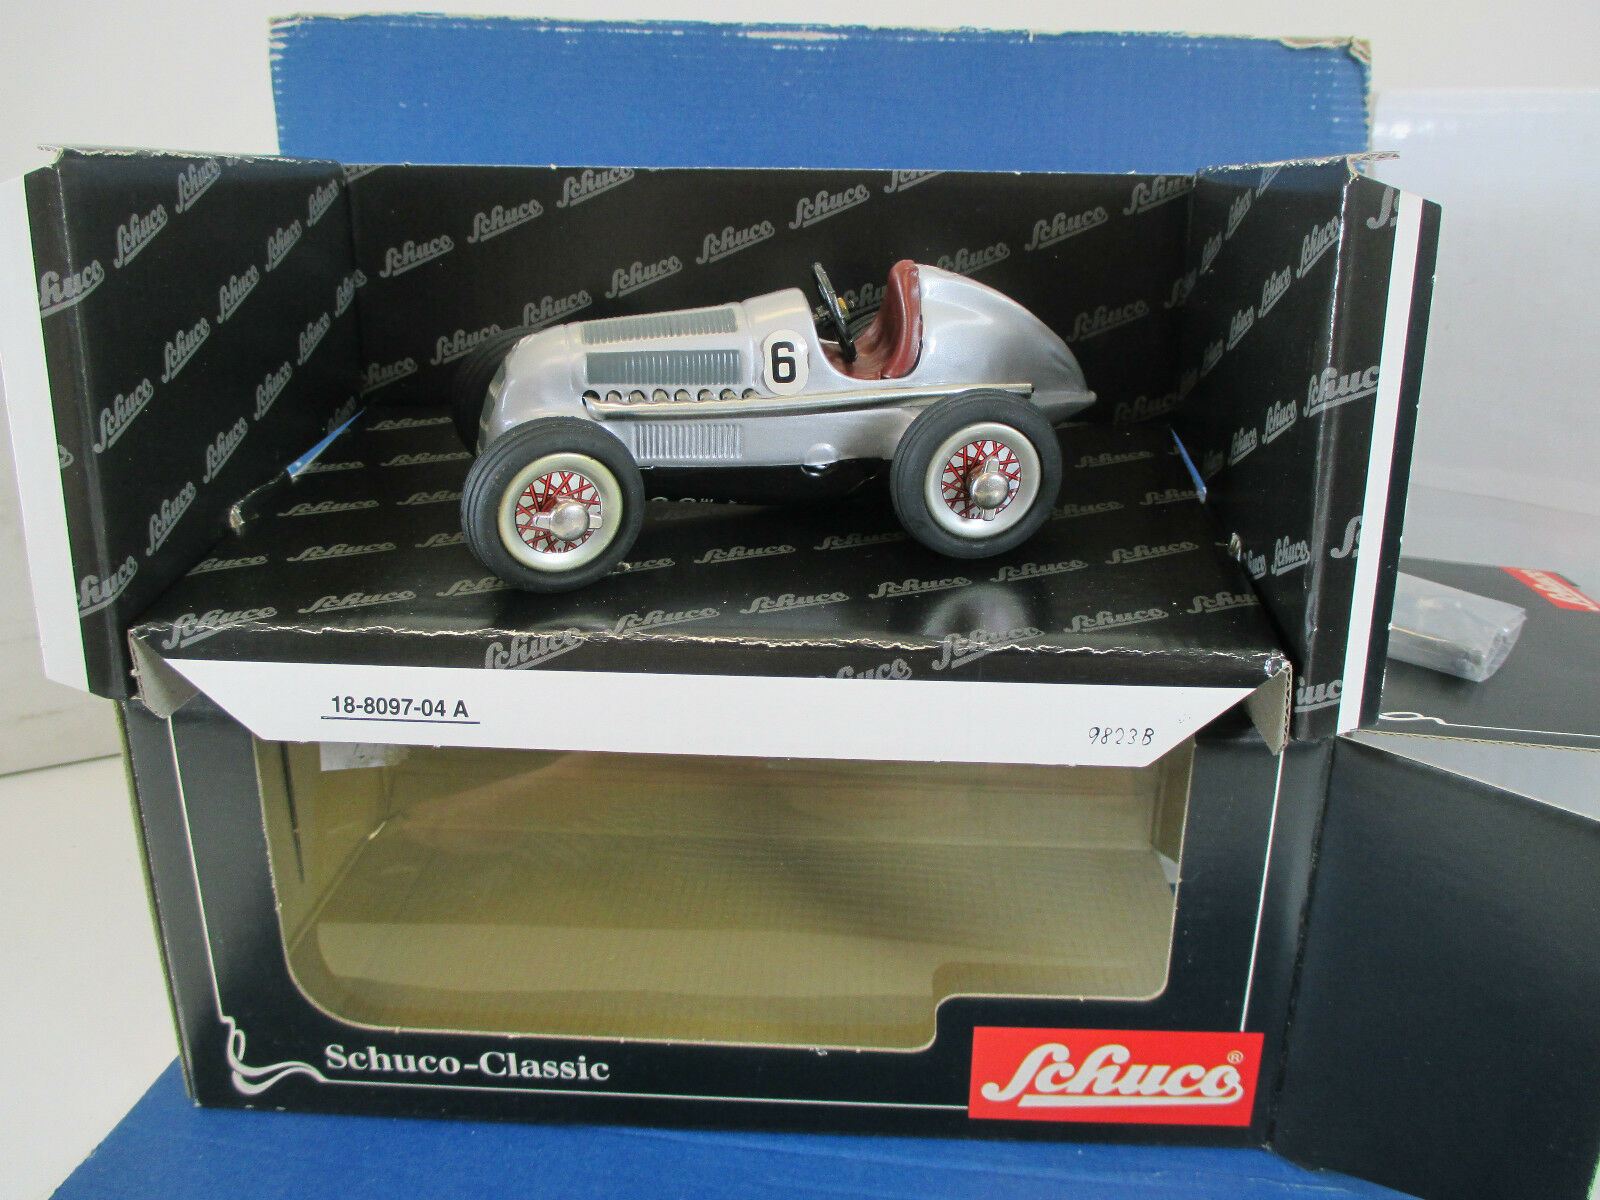 Schuco 01007 studio 1050 schuco-Classic voir photo b7515